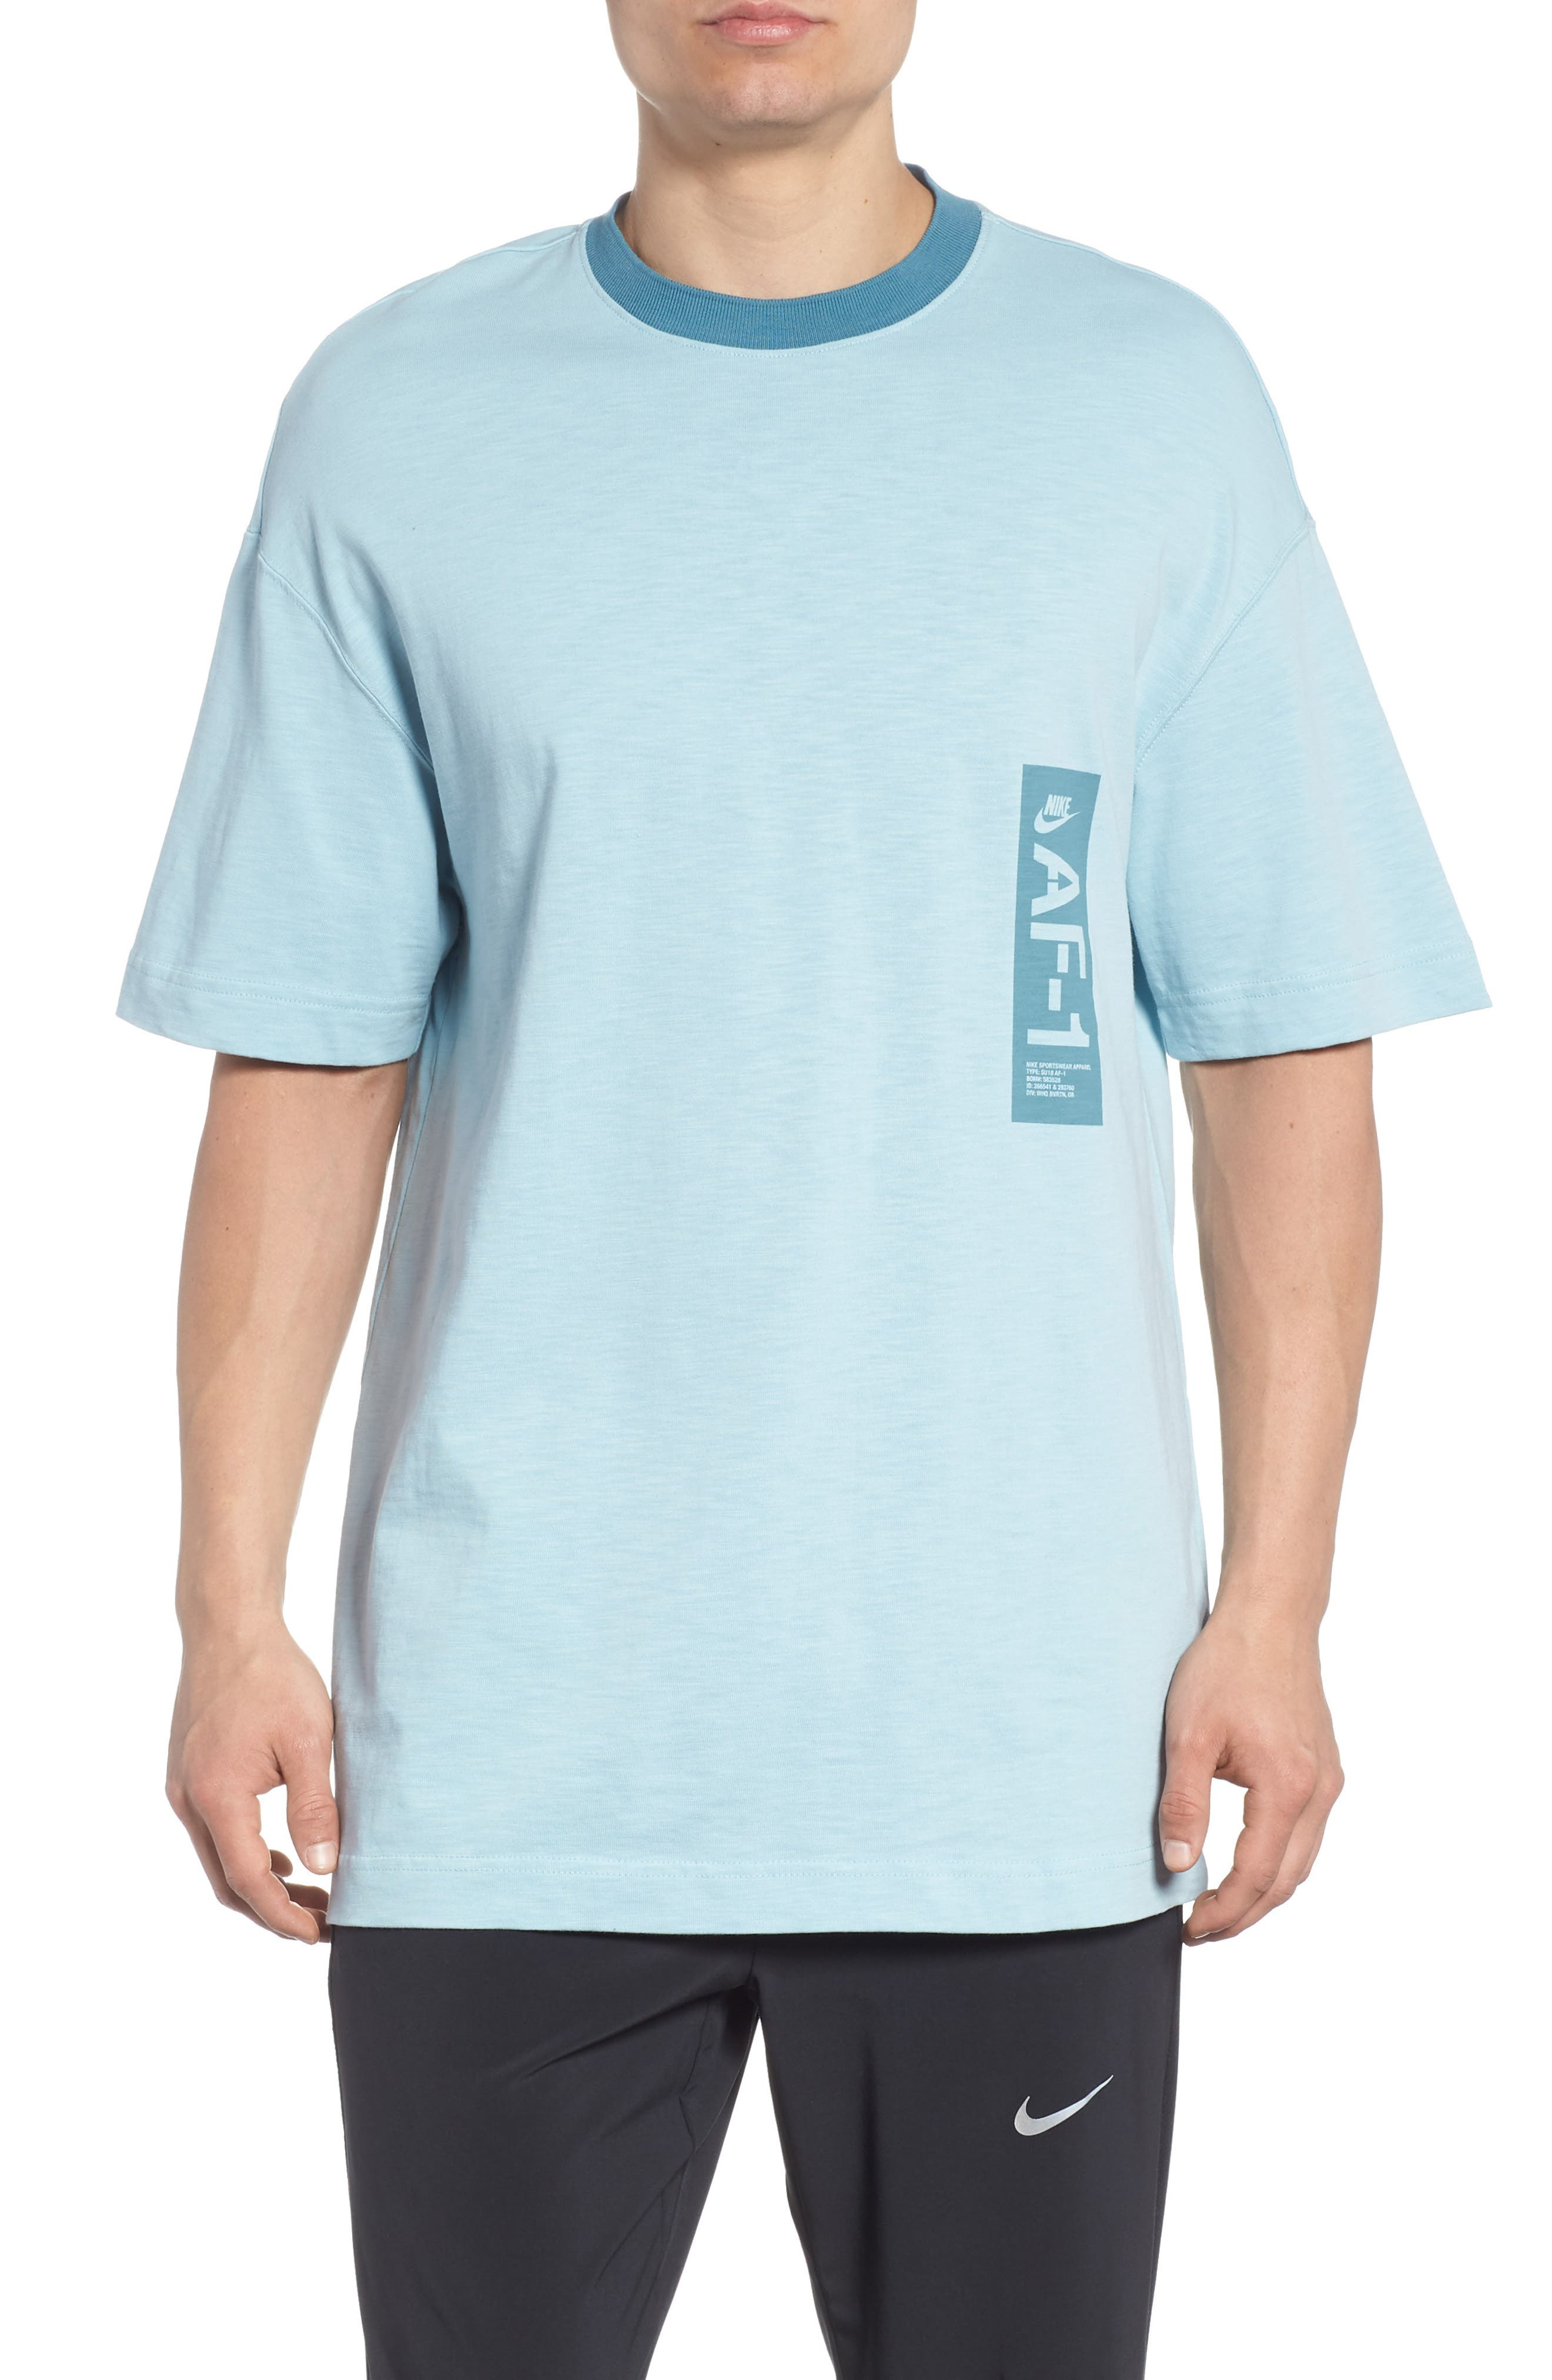 Sportswear AF1 Graphic T-Shirt,                             Main thumbnail 1, color,                             Ocean Bliss/ Noise Aqua